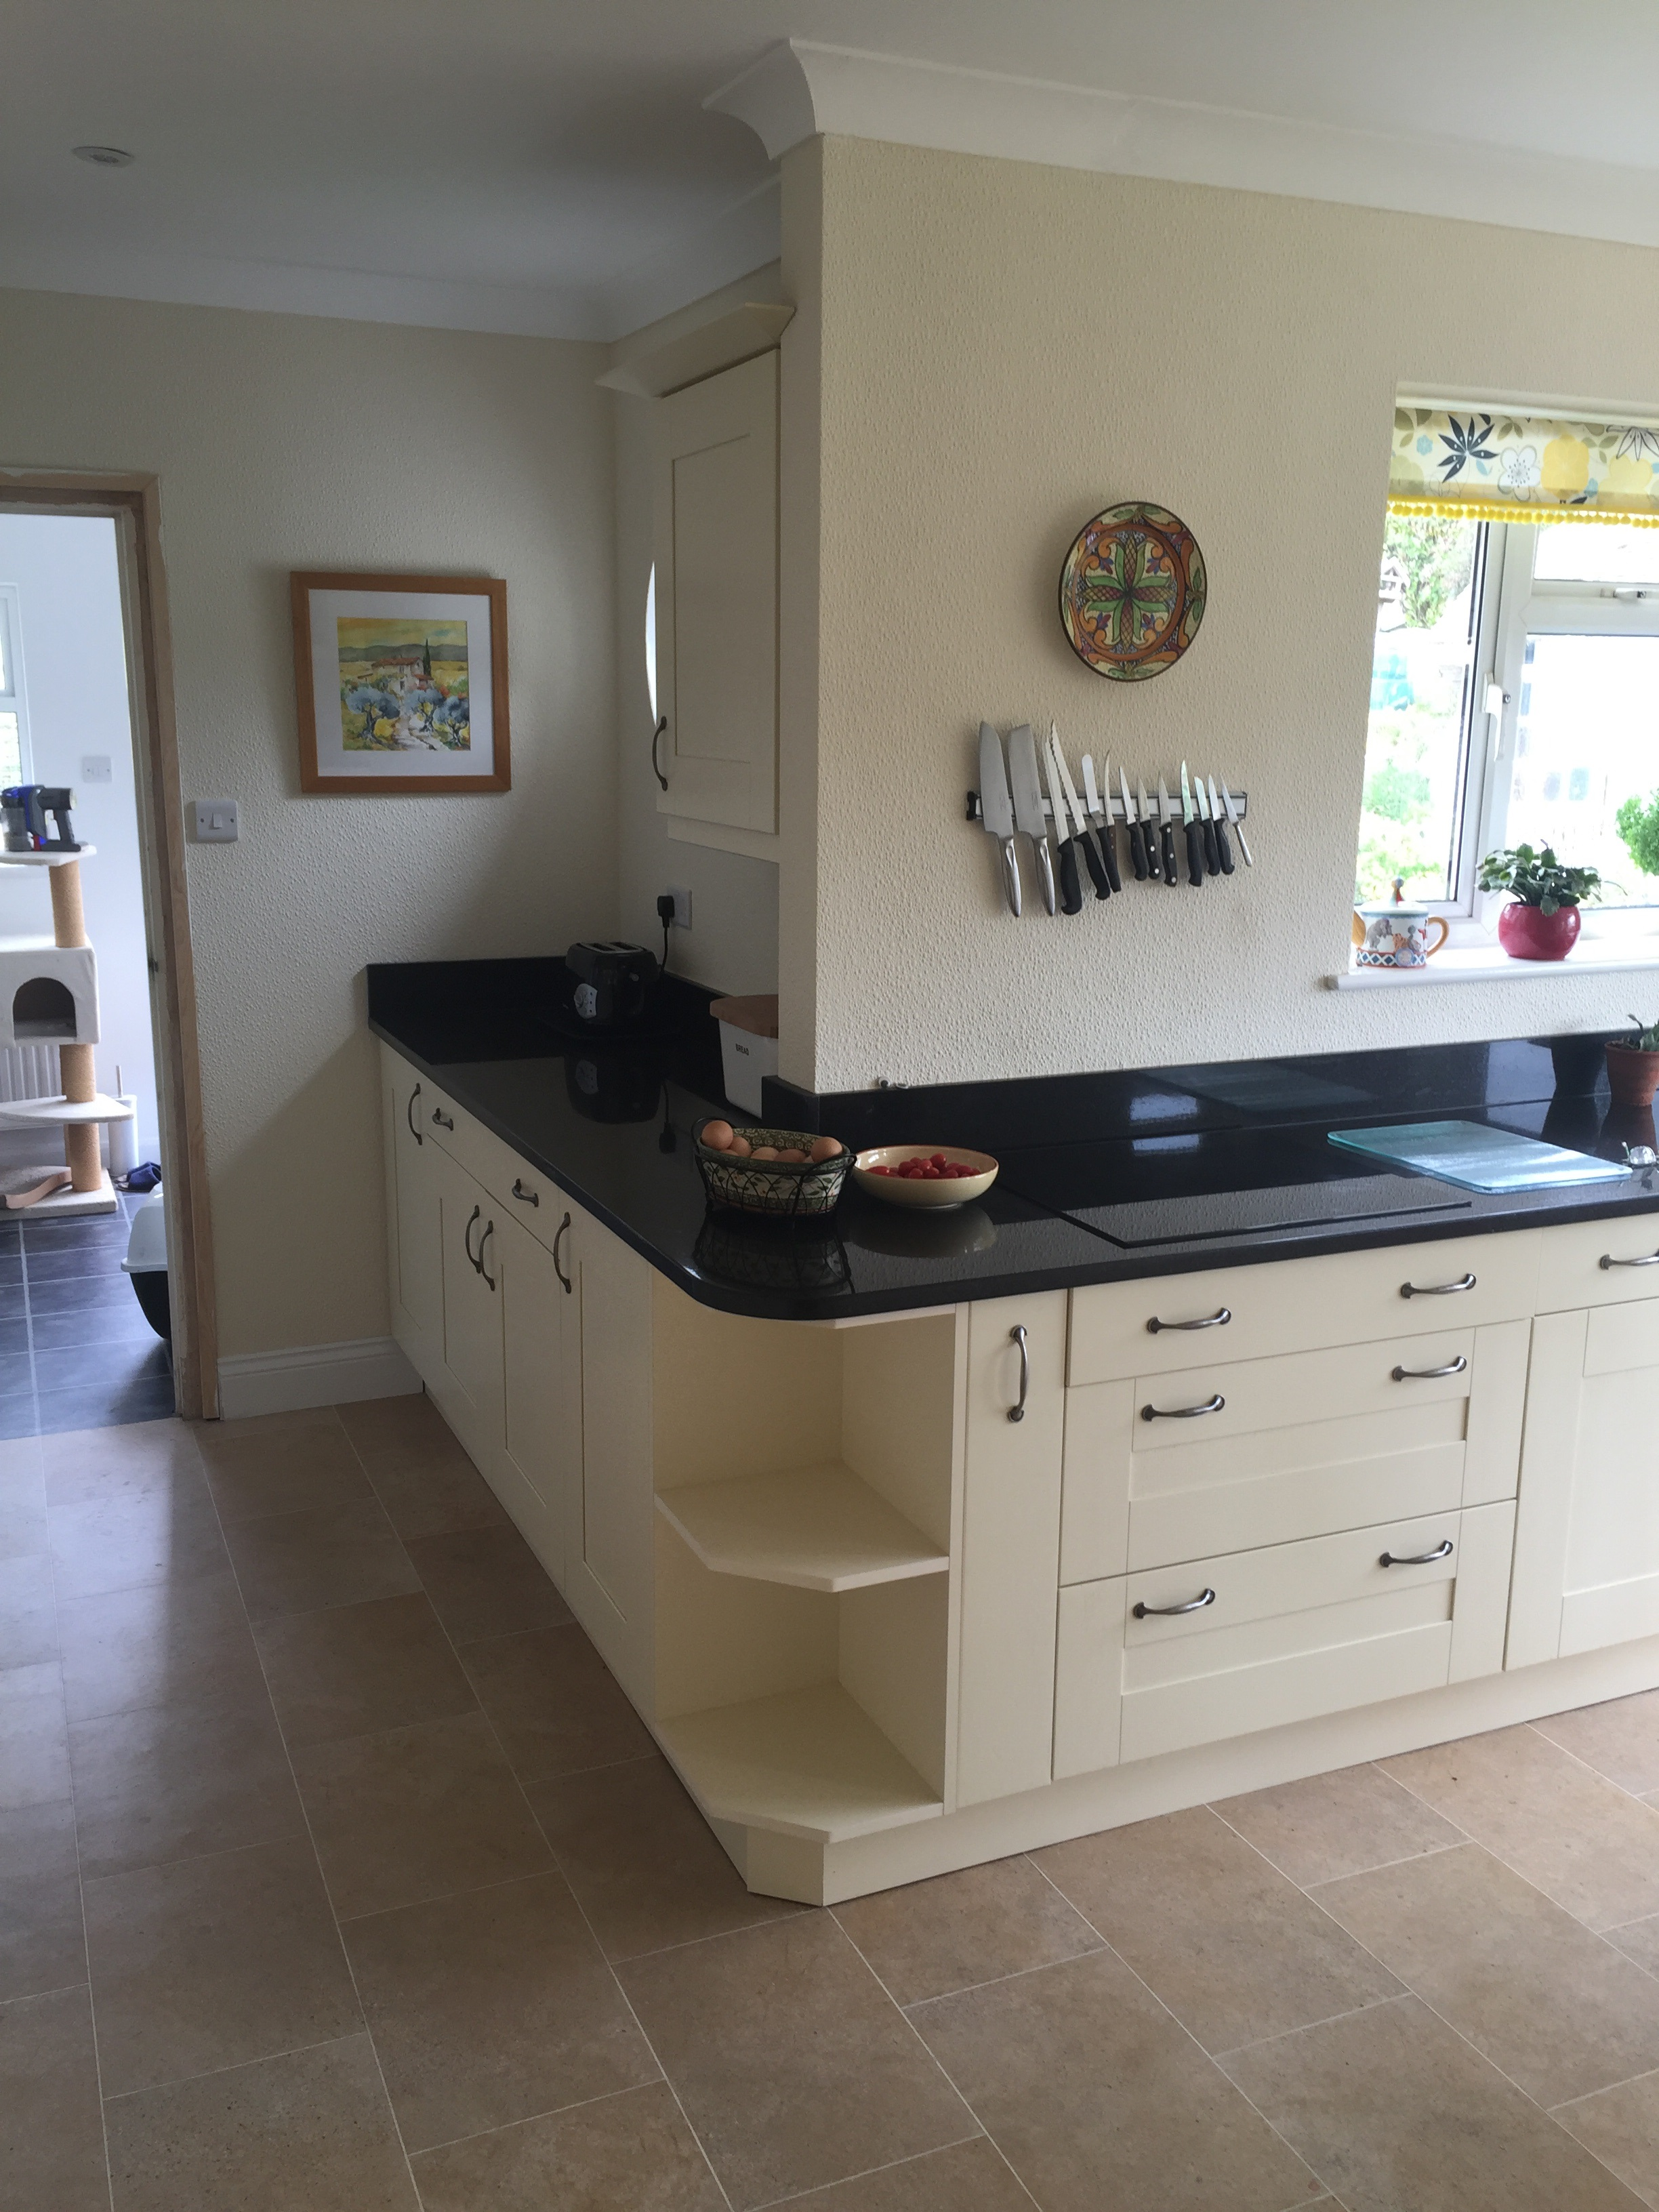 Broadoak Ivory kitchen